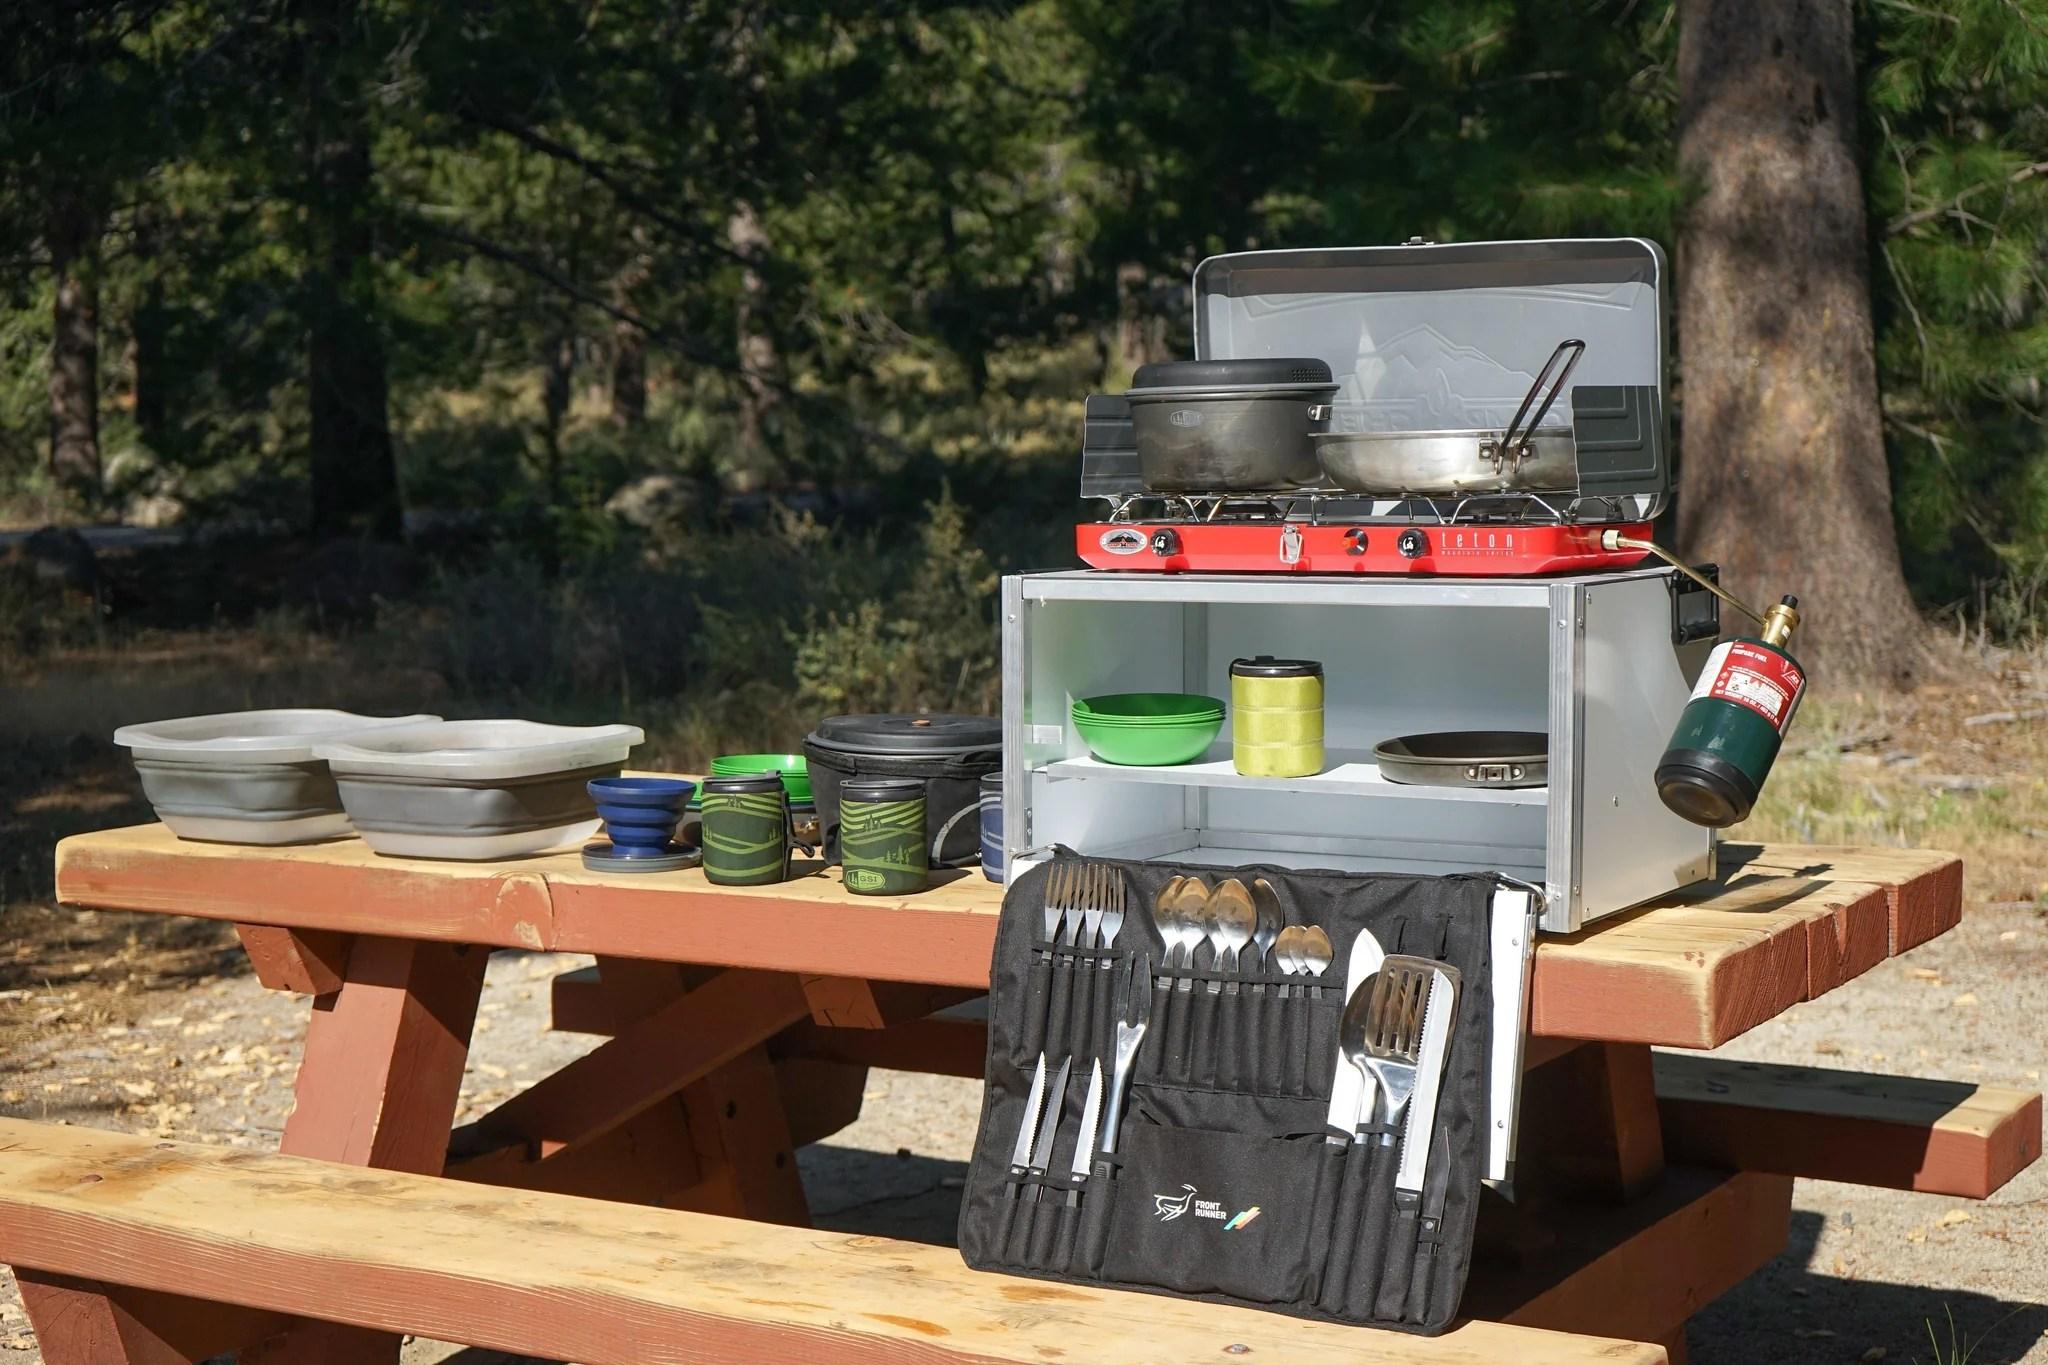 Mobile Outdoor Küche Camping : Mobile outdoor küche camping rocket stove org micro mobile